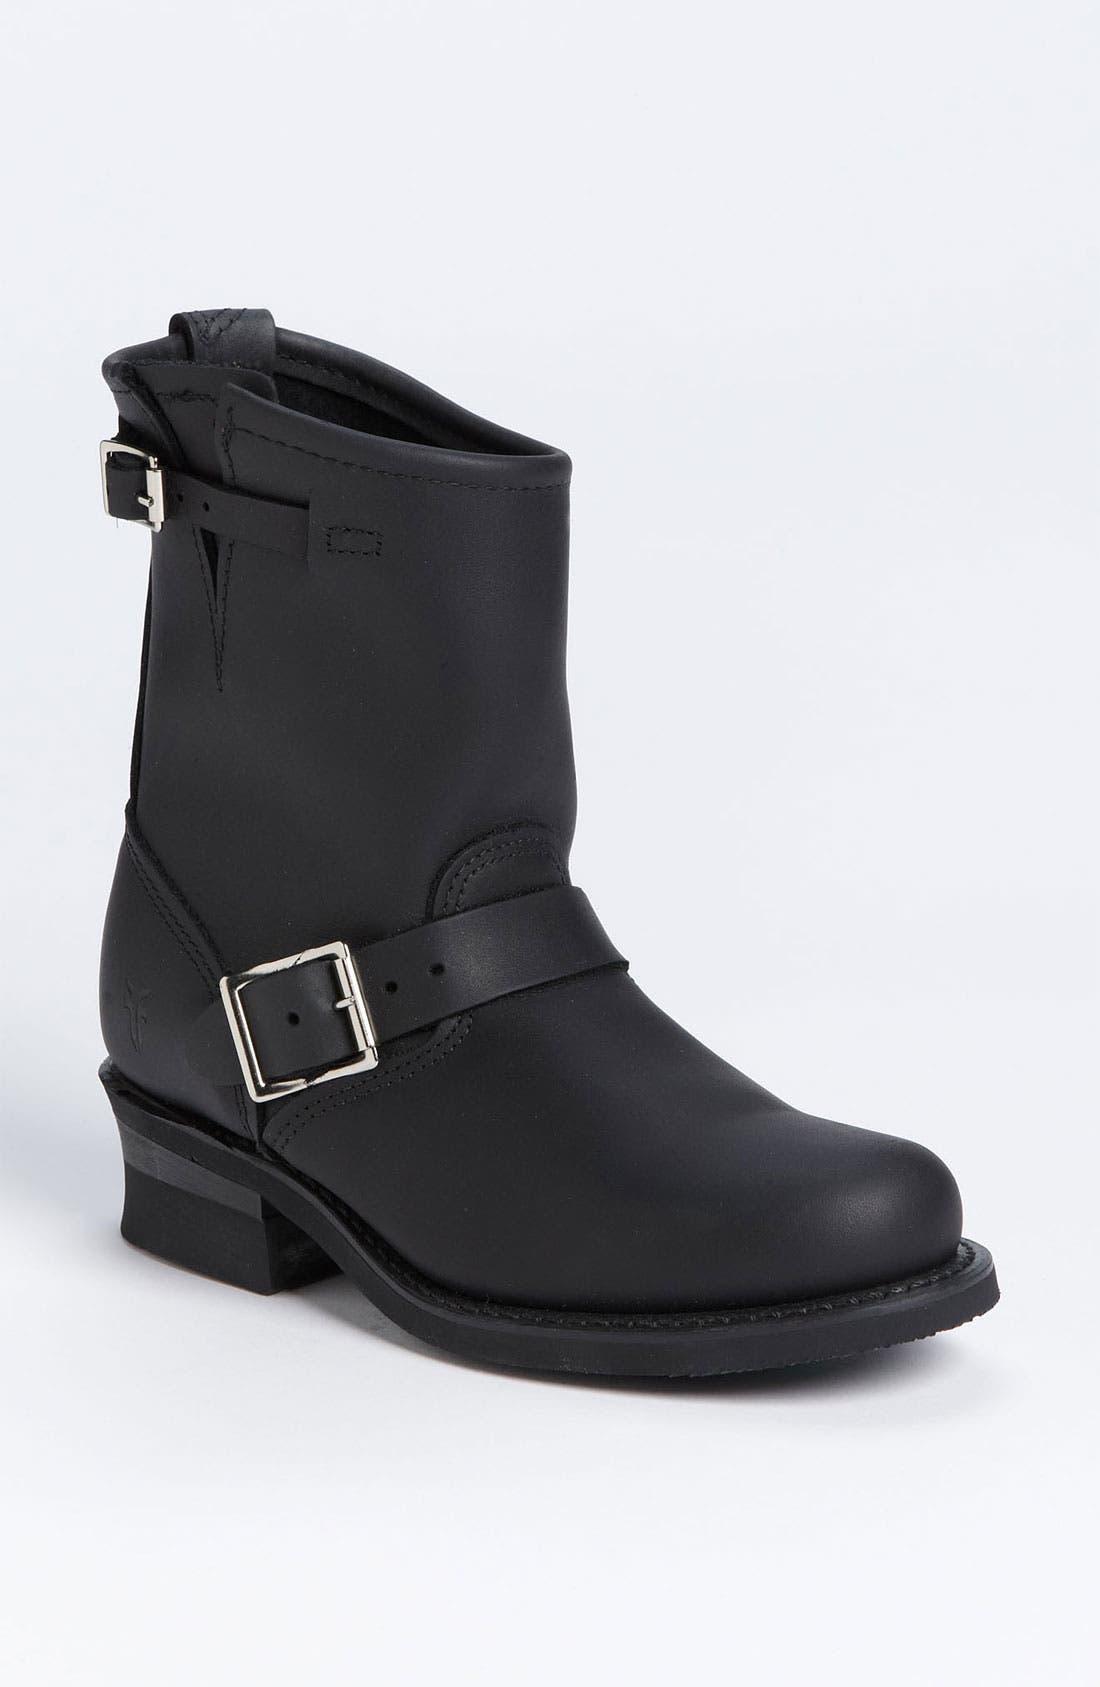 b2c50eb66fb Frye  Engineer 8R  Leather Boot- Black